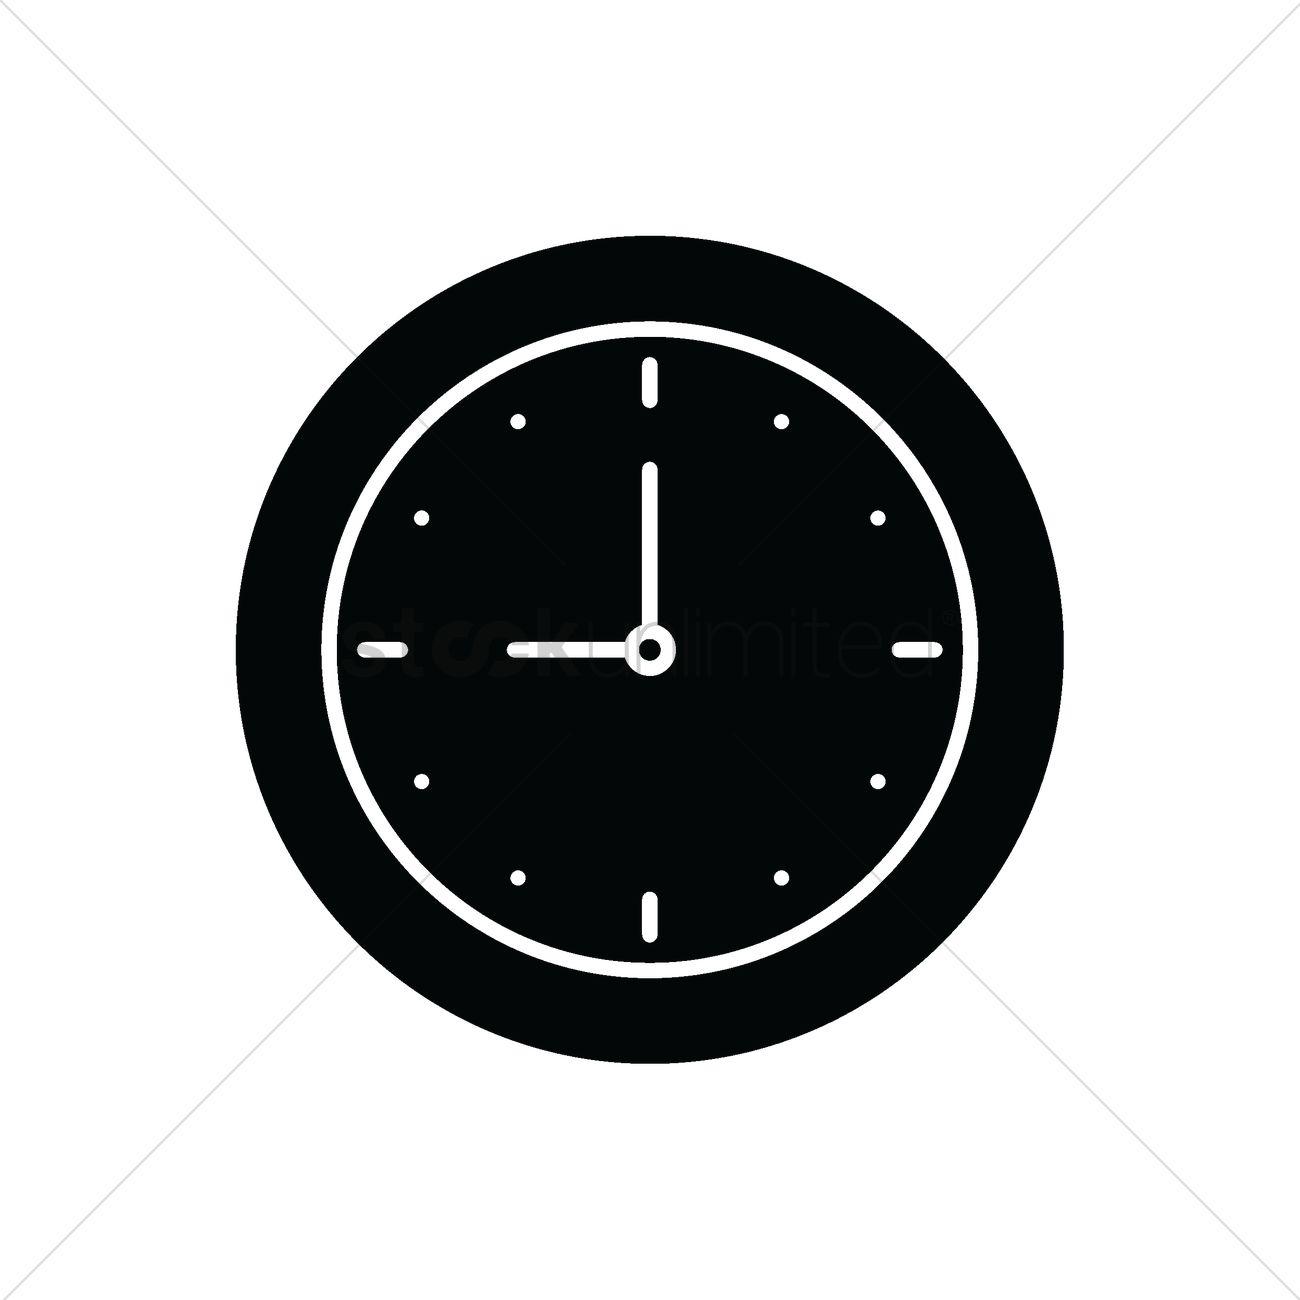 Clock icon Vector Image - 2002468   StockUnlimited